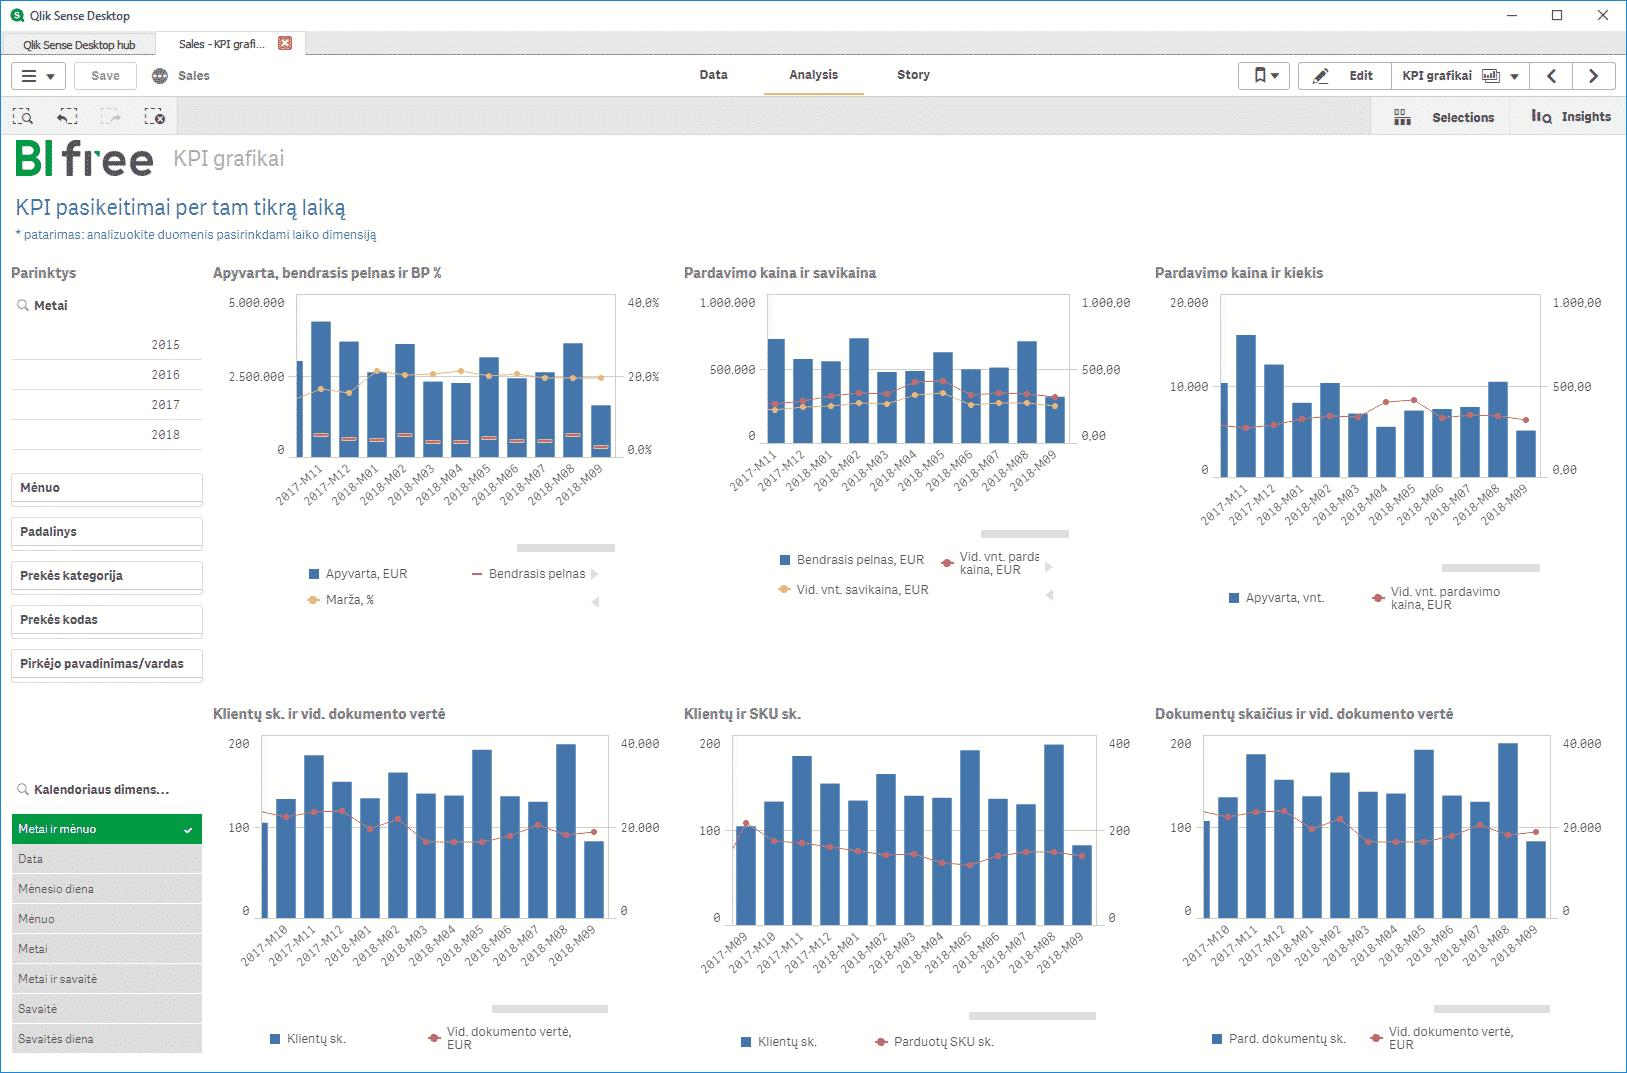 BI Free KPI grafikai